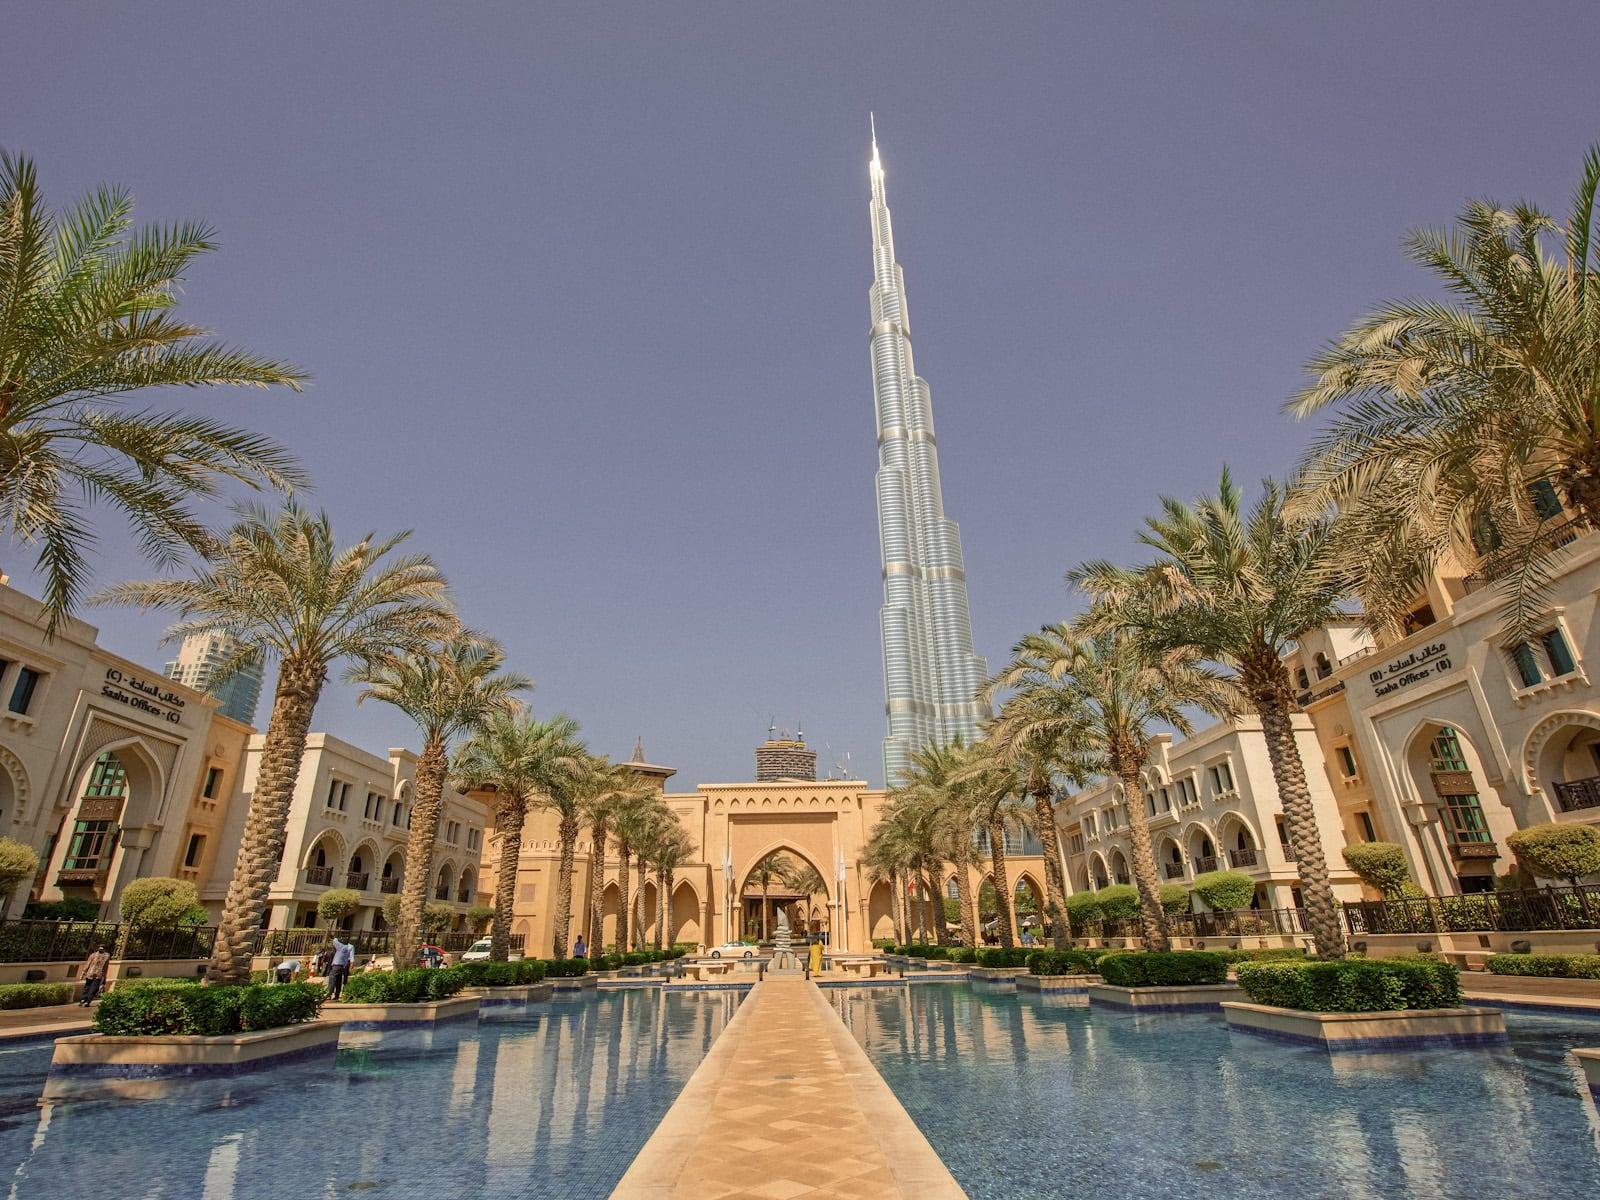 Burj Khalifa Palace Downtown Dubai 1